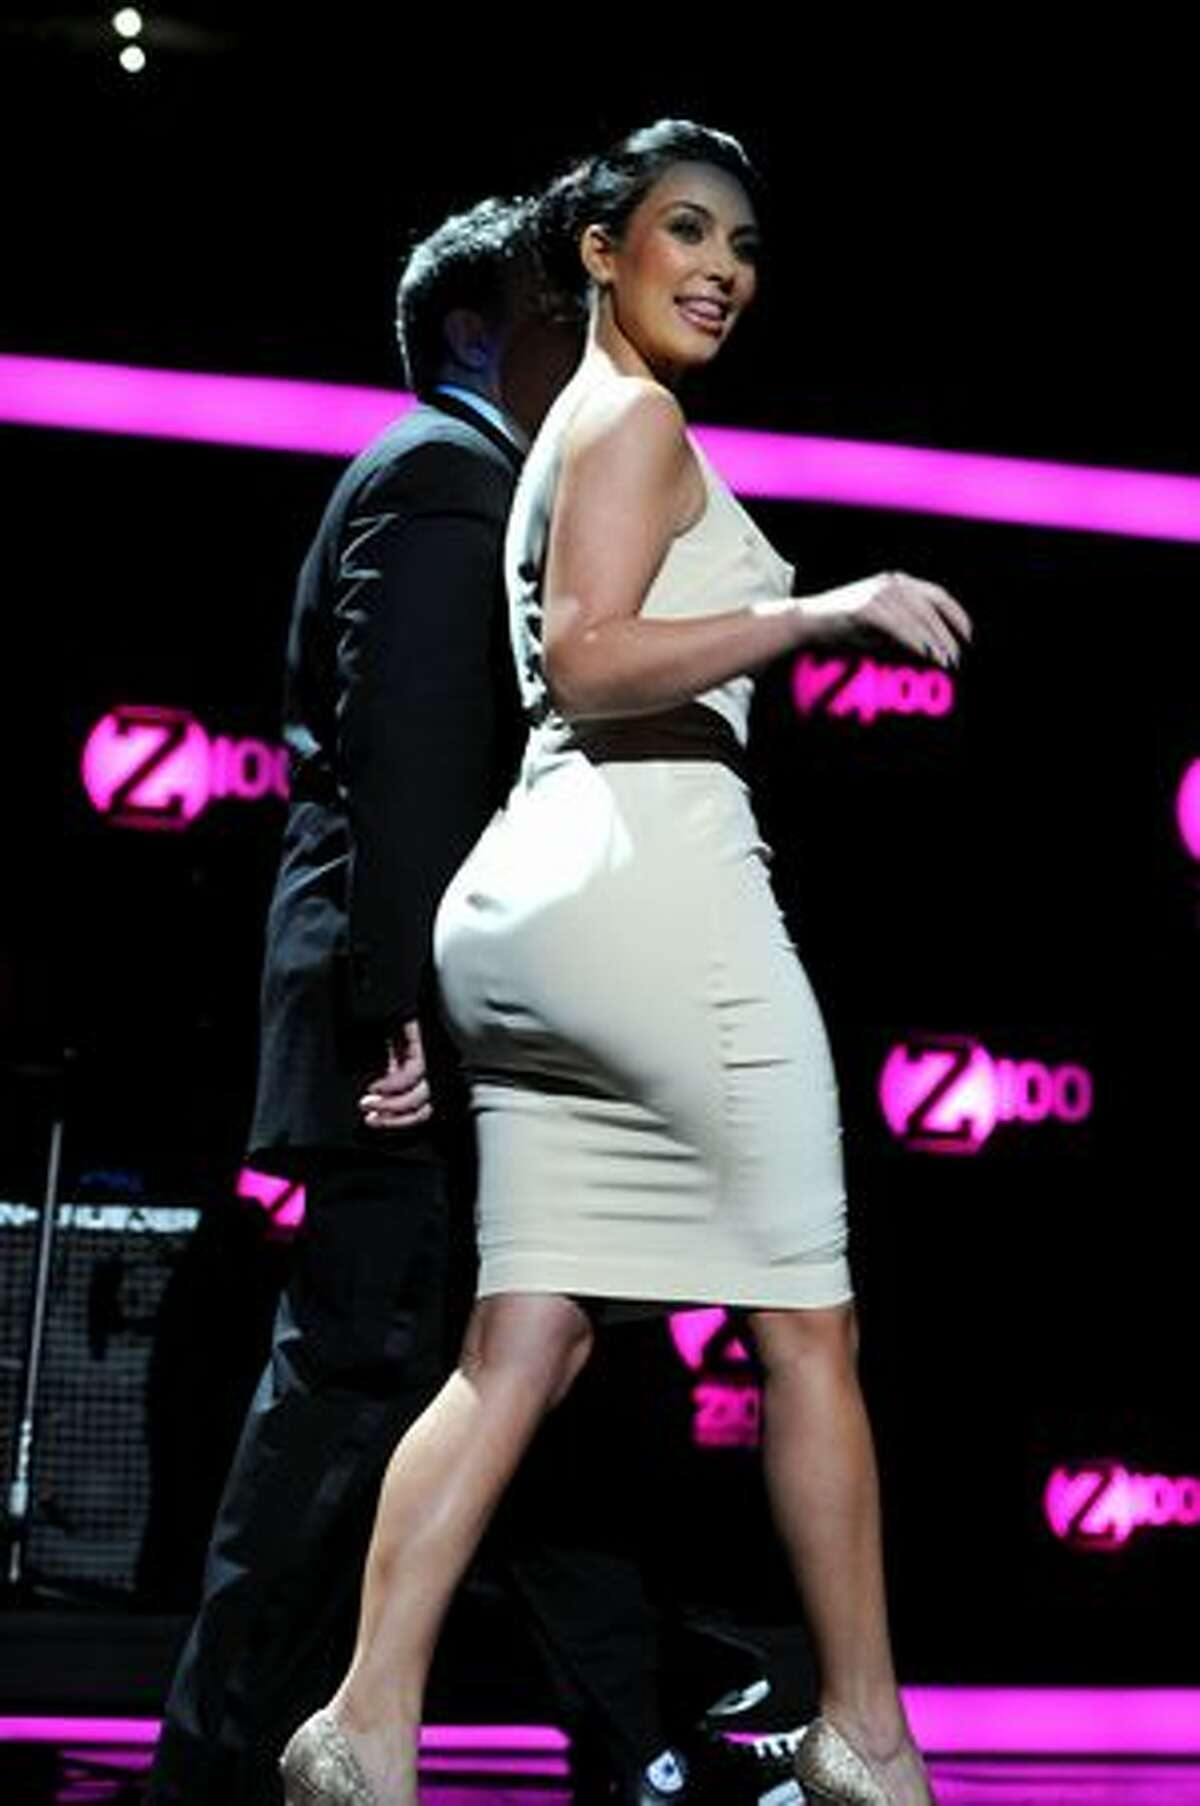 Host Elvis Duran of Z100 and Kim Kardashian walk onstage.